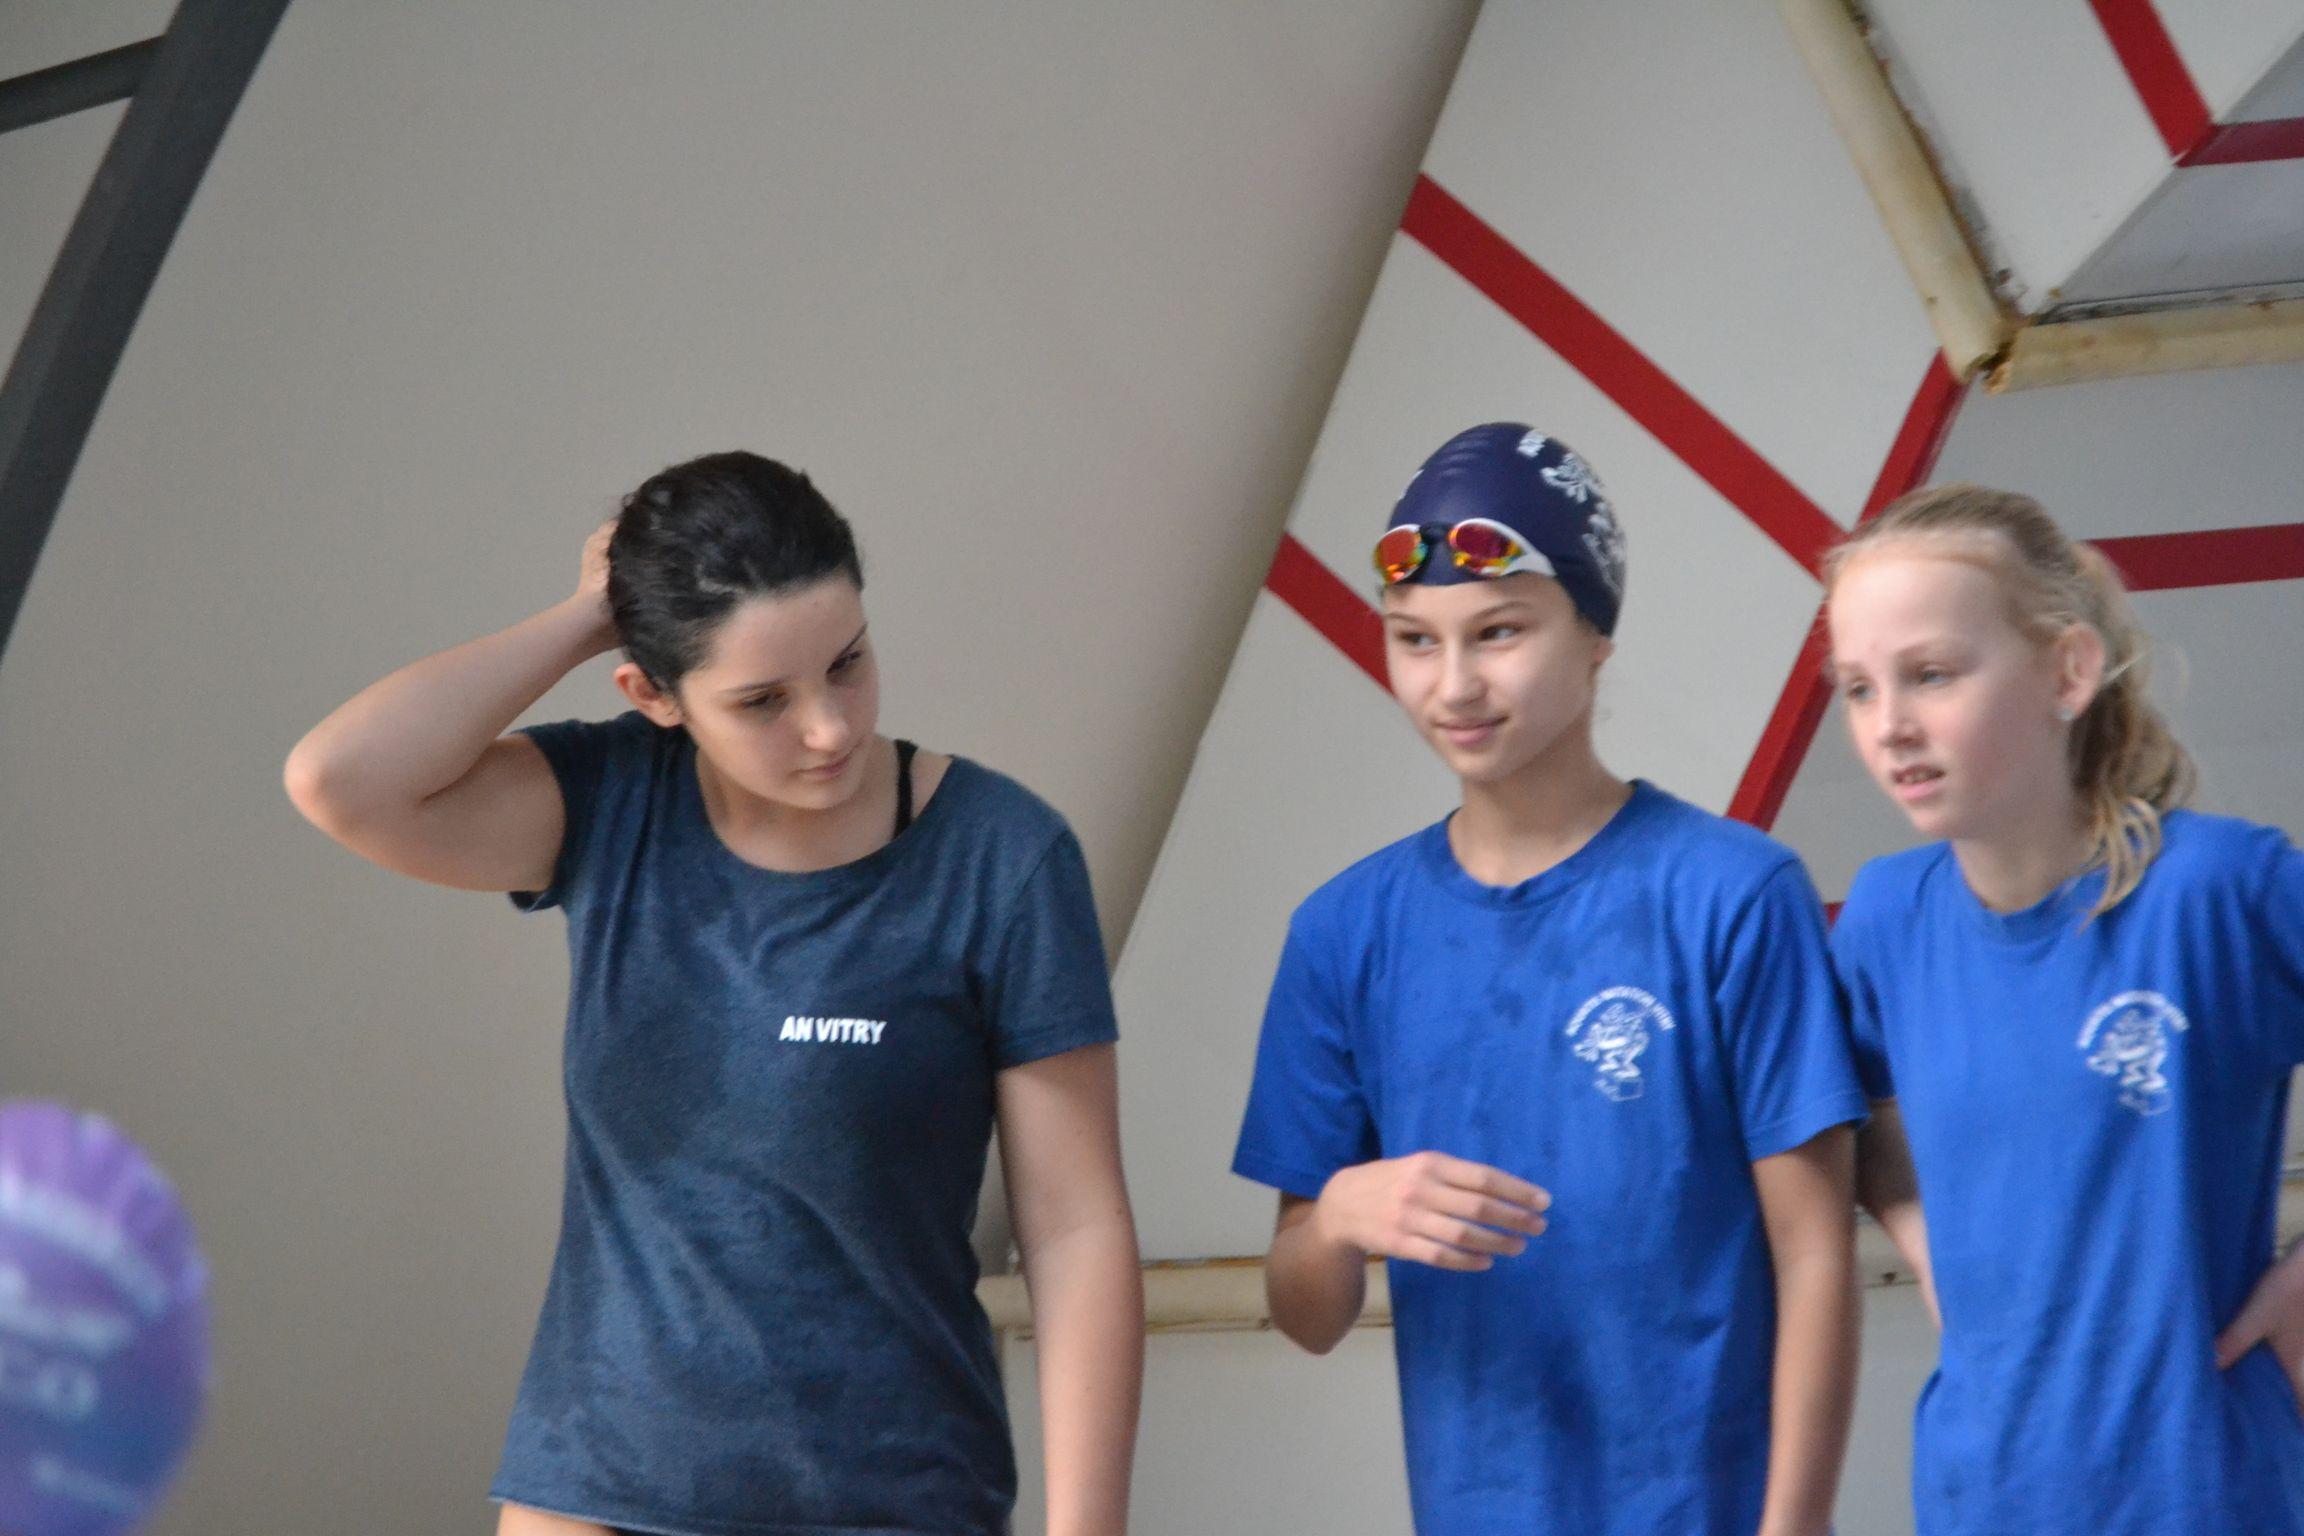 AN Vitry, test, club, natation